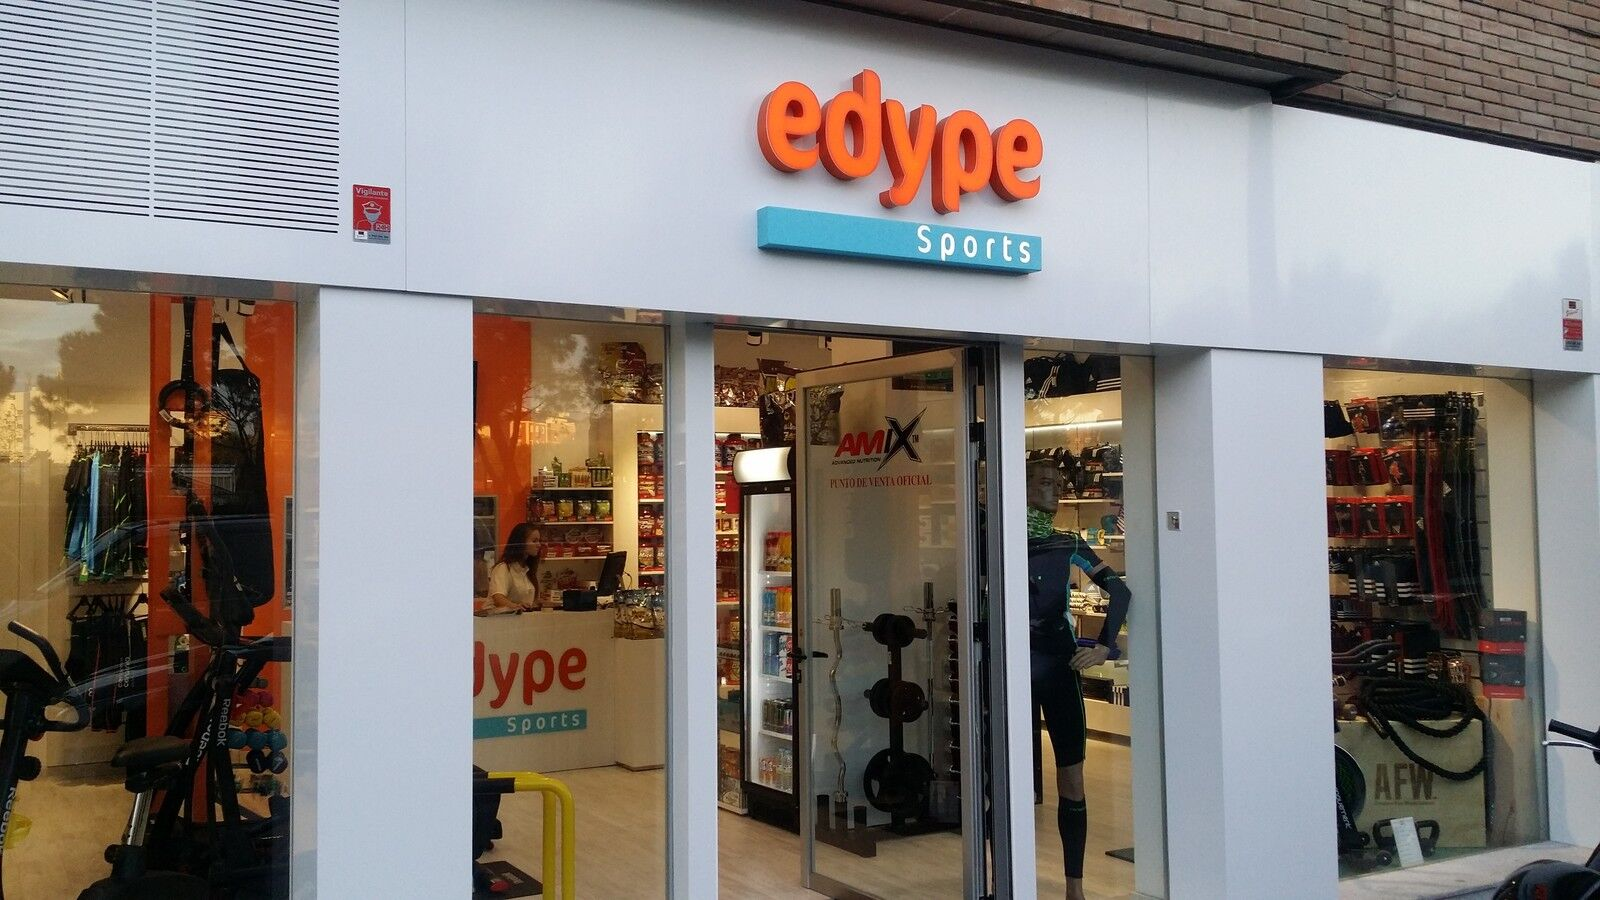 edype Sports